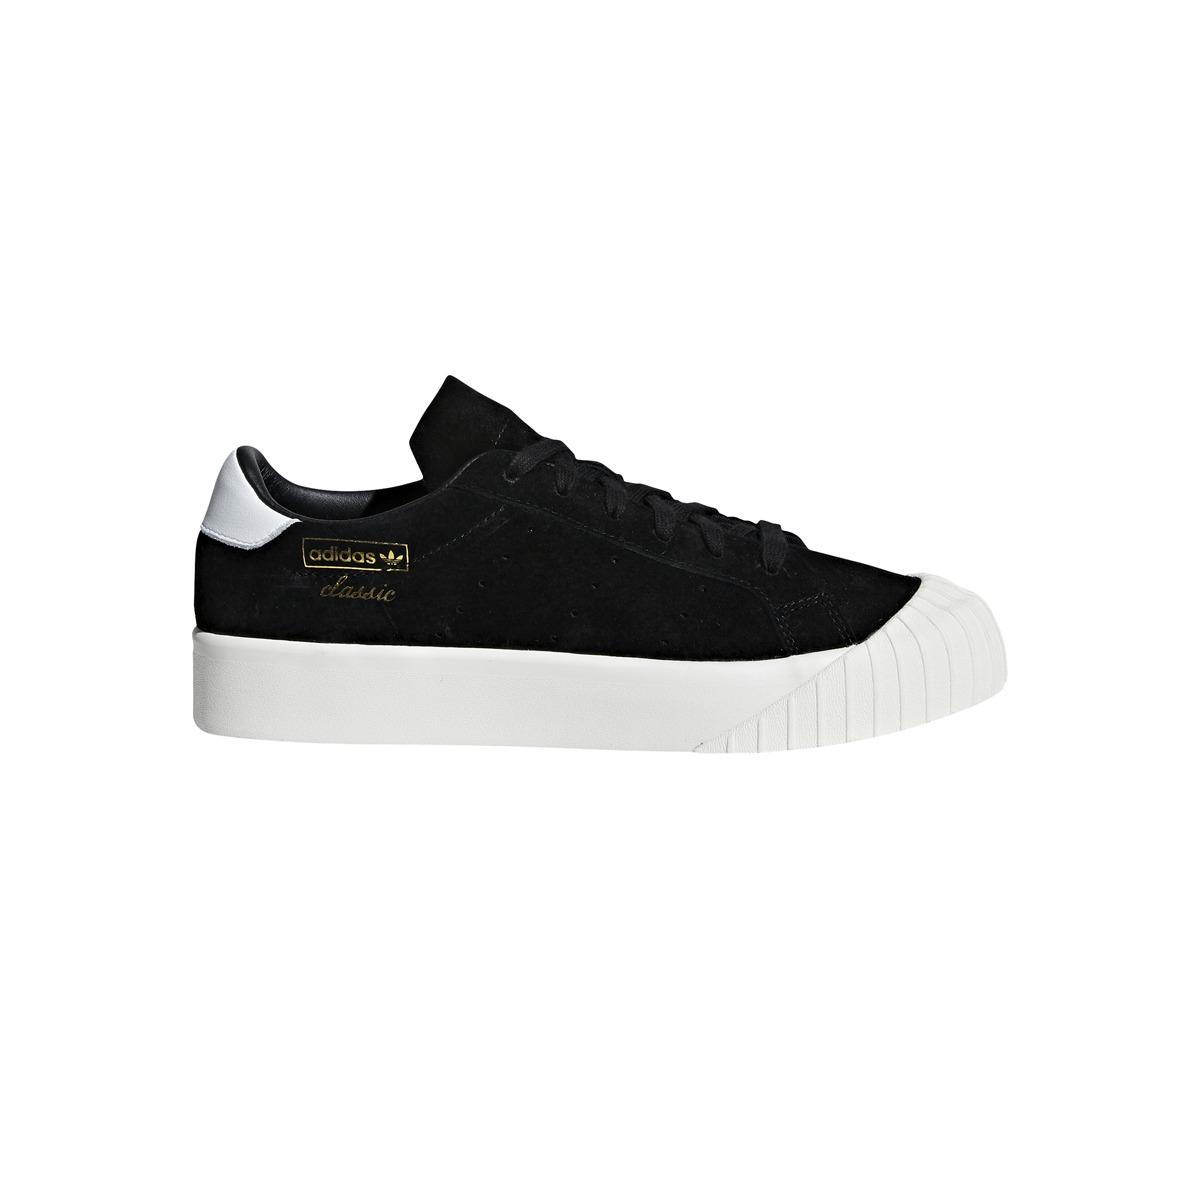 timeless design 41293 a97c7 Zapatillas adidas Originals Moda Everyn W Mujer Ng bl -   3.999,00 ...